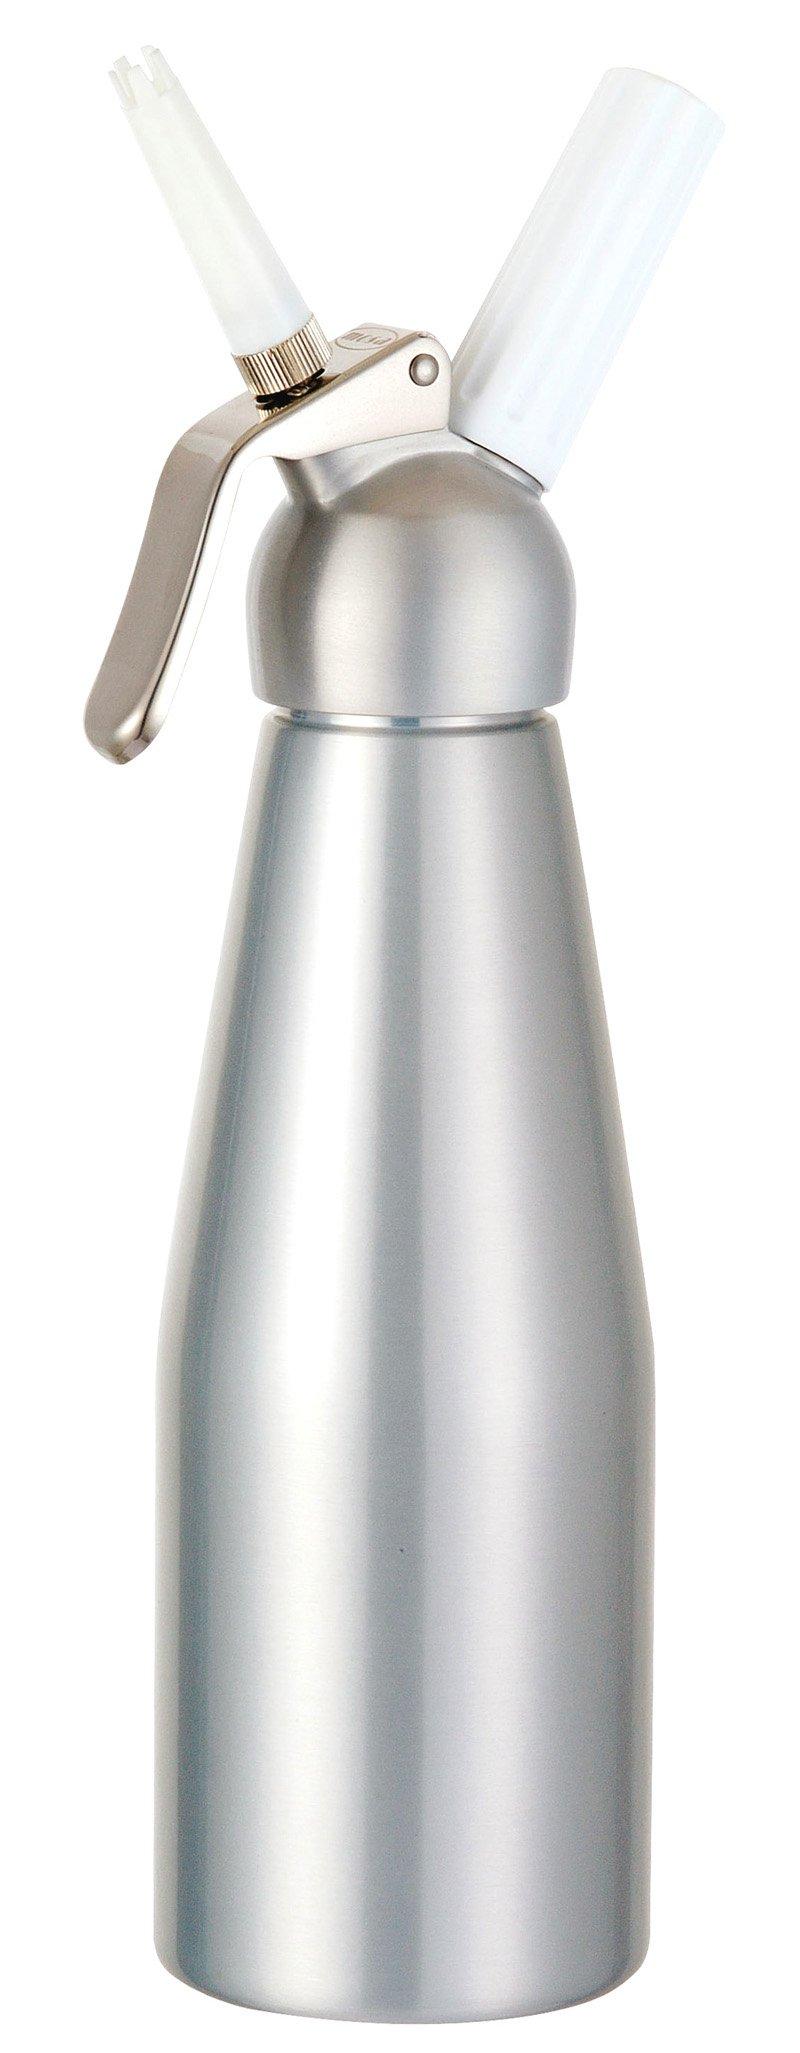 Mosa TW Whipped Cream Dispenser- Full Pint Solid Aluminum